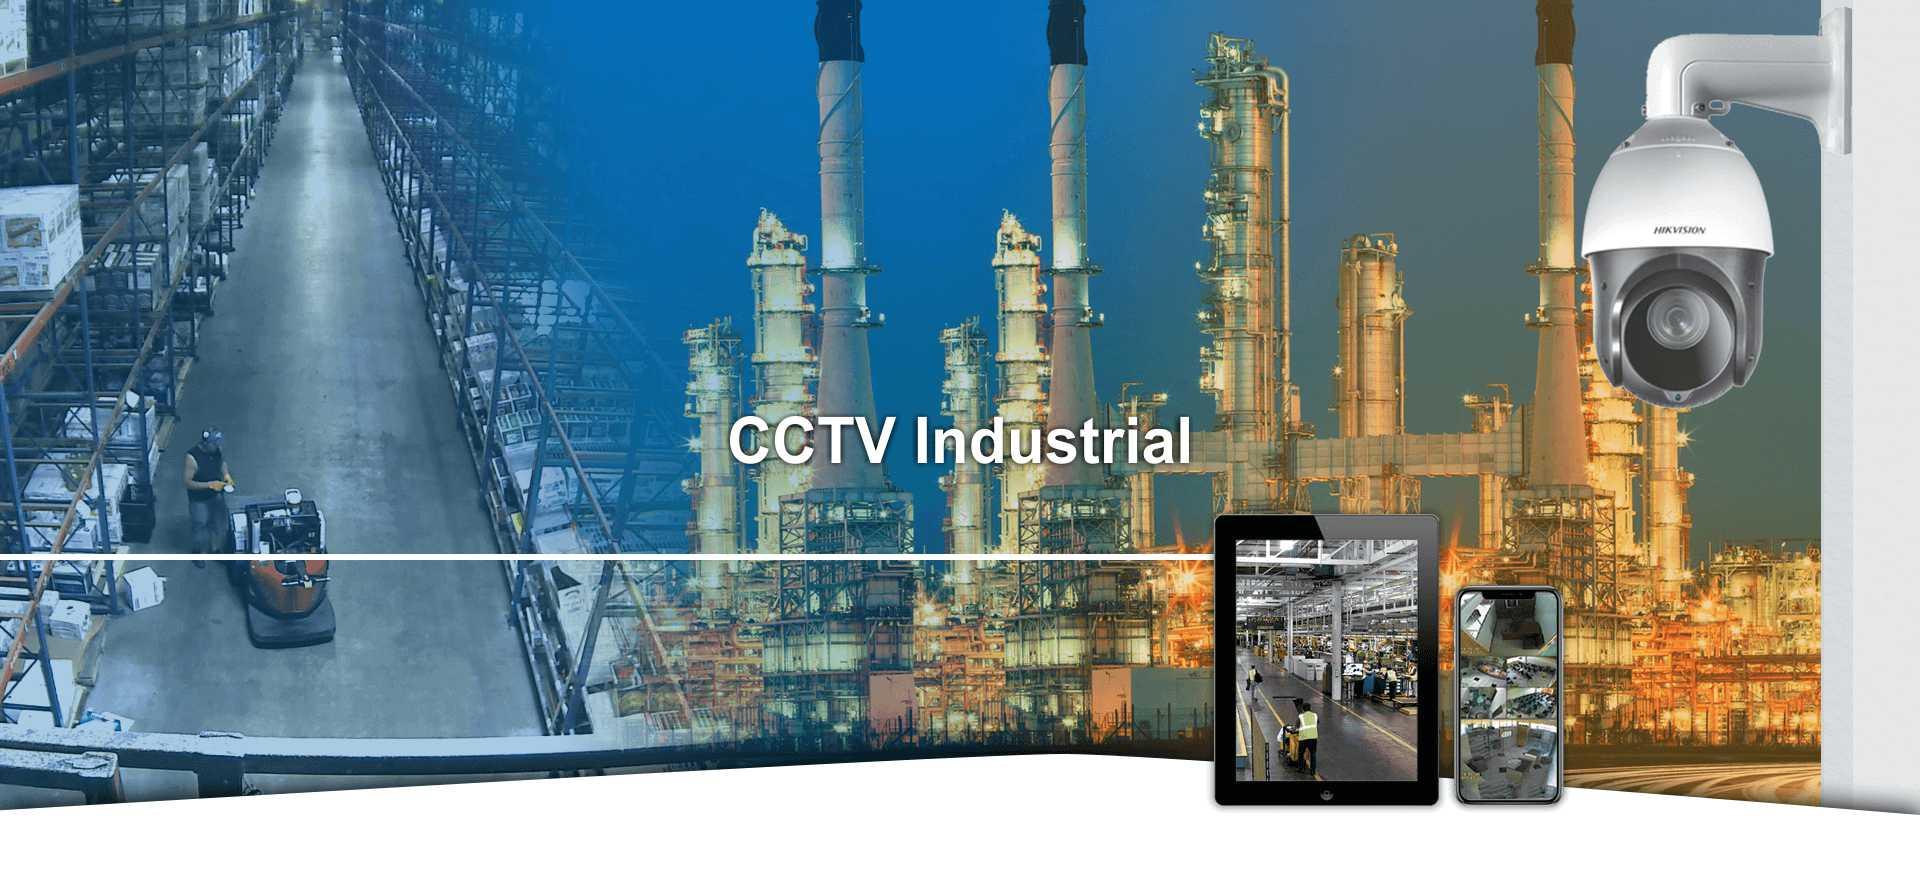 CCTV Industrial en Lázaro Cárdenas, Michoacán e Ixtapa Zihuatanejo, Guerrero